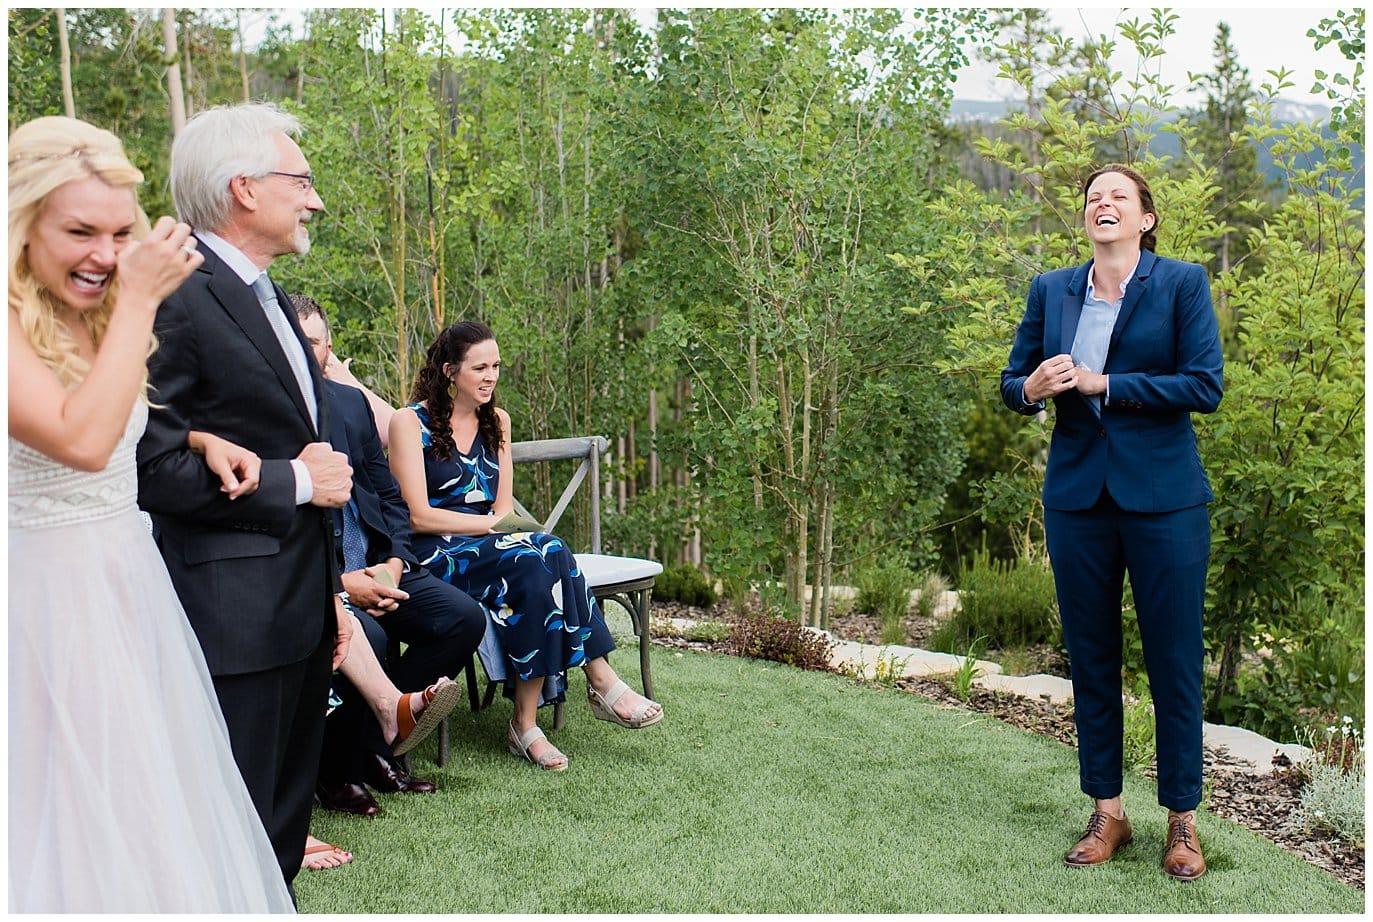 emotional brides private home wedding photo